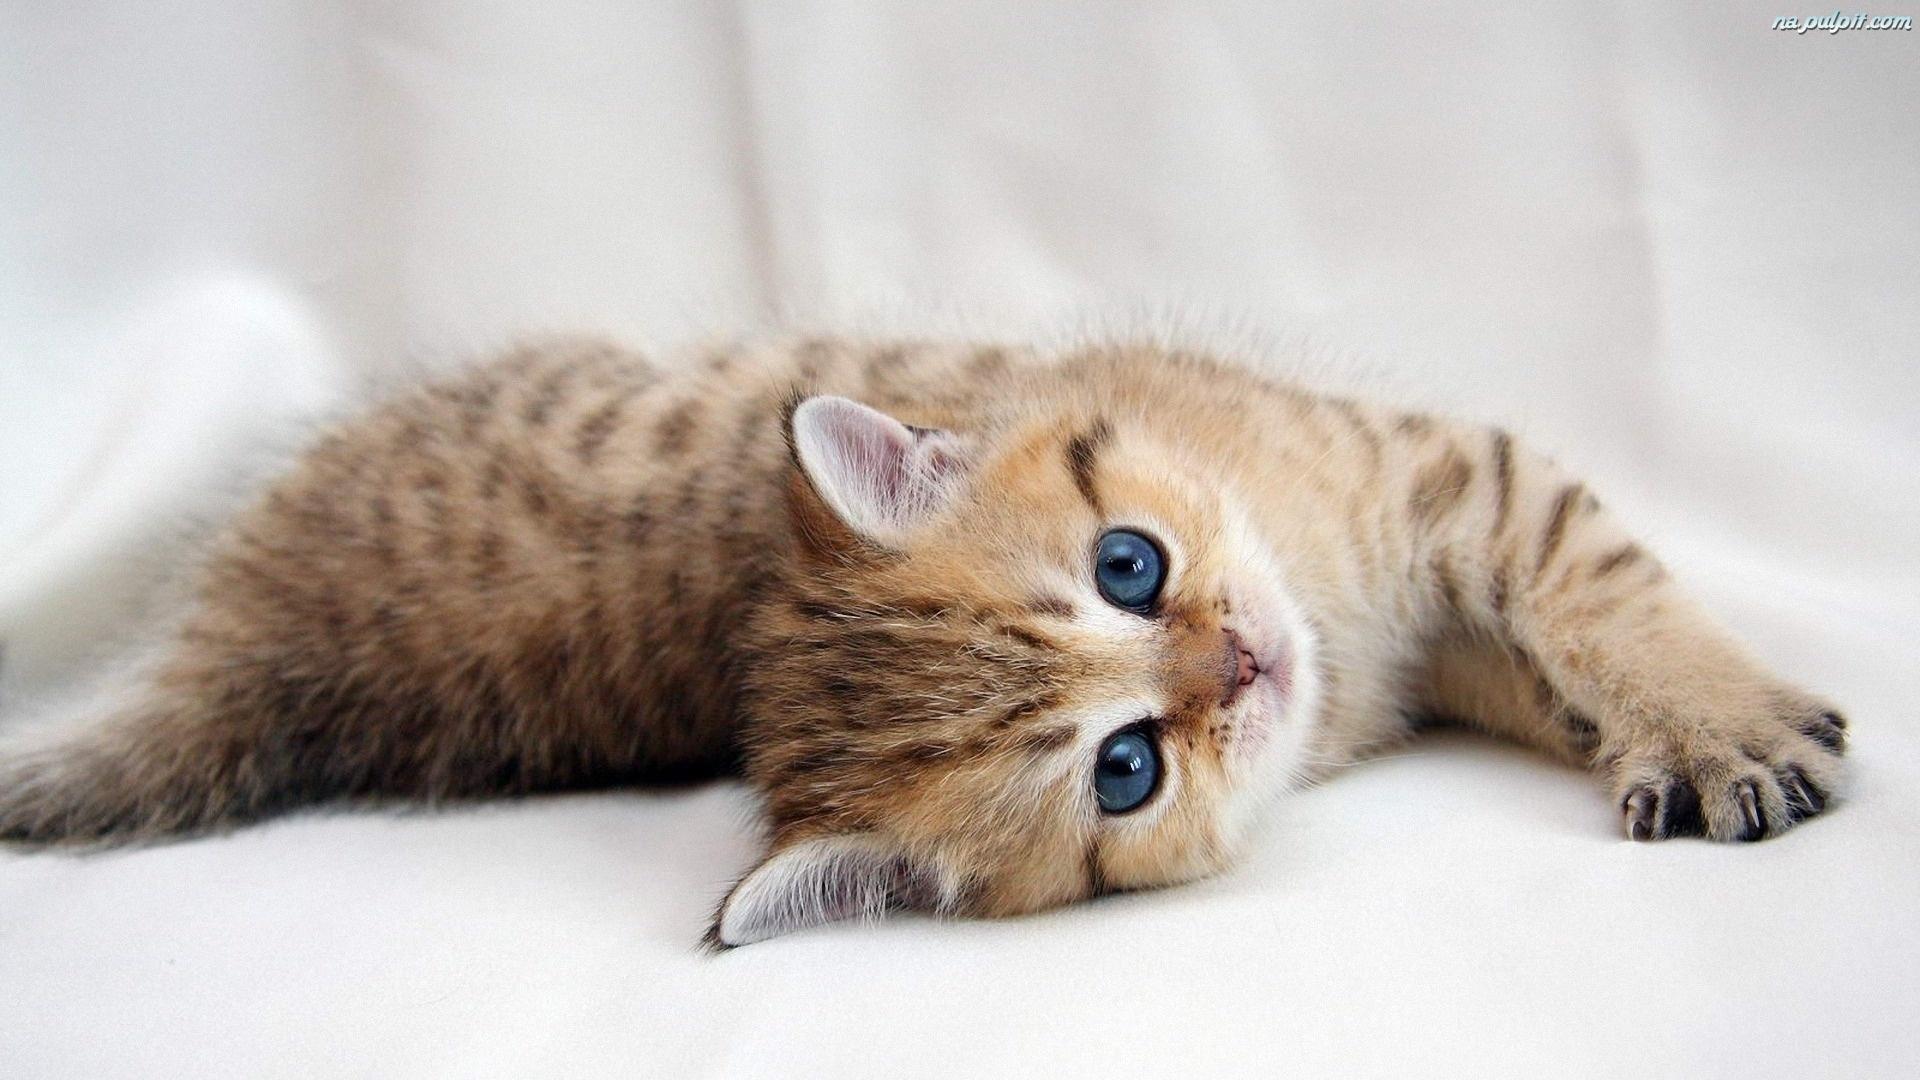 Mysterii ejejej kotek s a - Cute kittens hd wallpaper free download ...